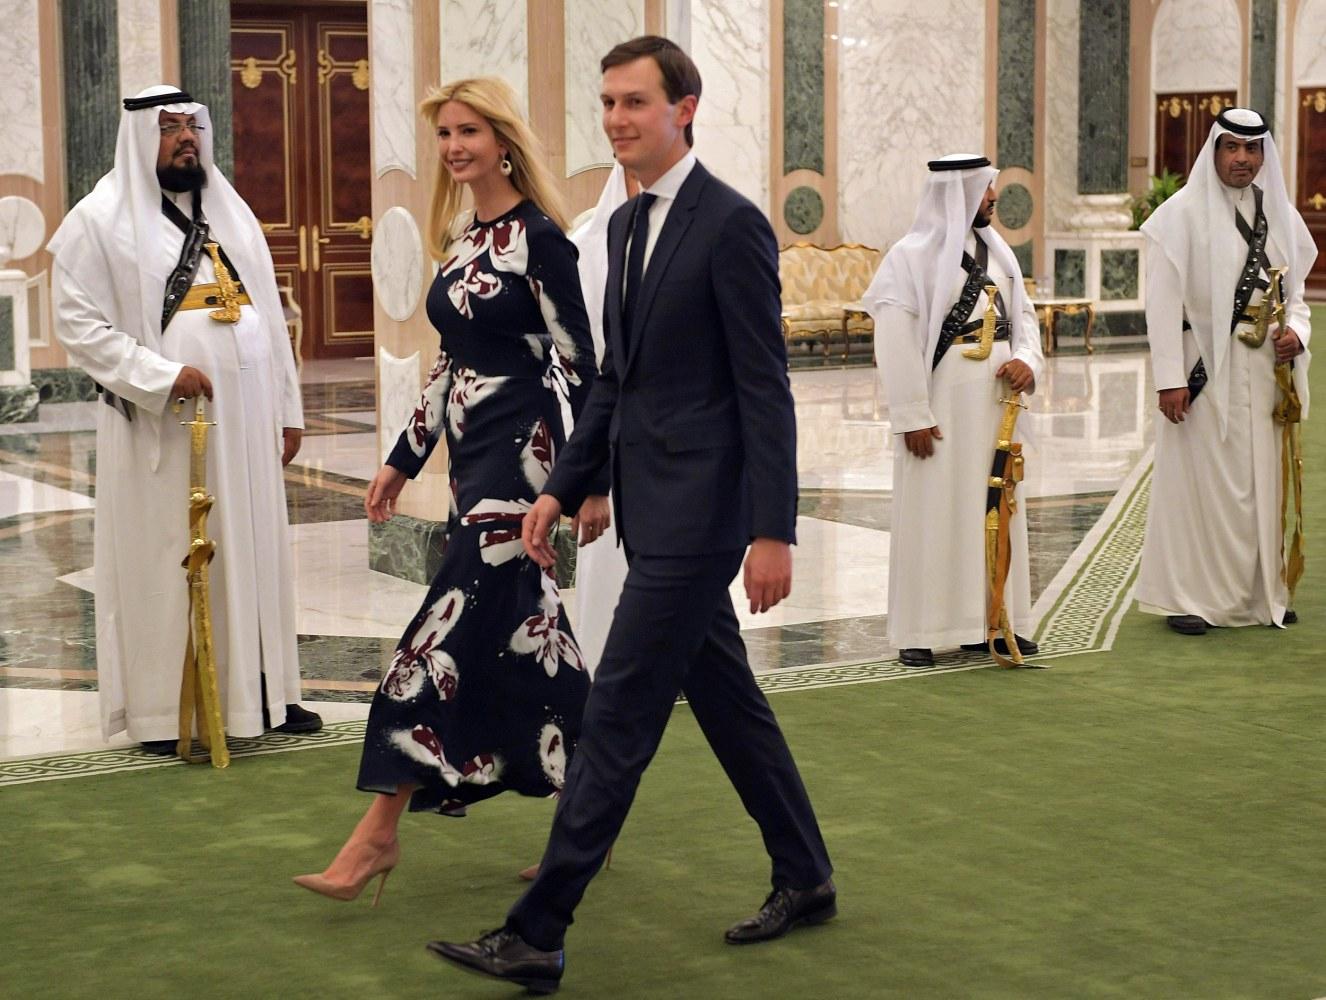 Melania Ivanka Trump Forgo Headscarves In Saudi Arabia